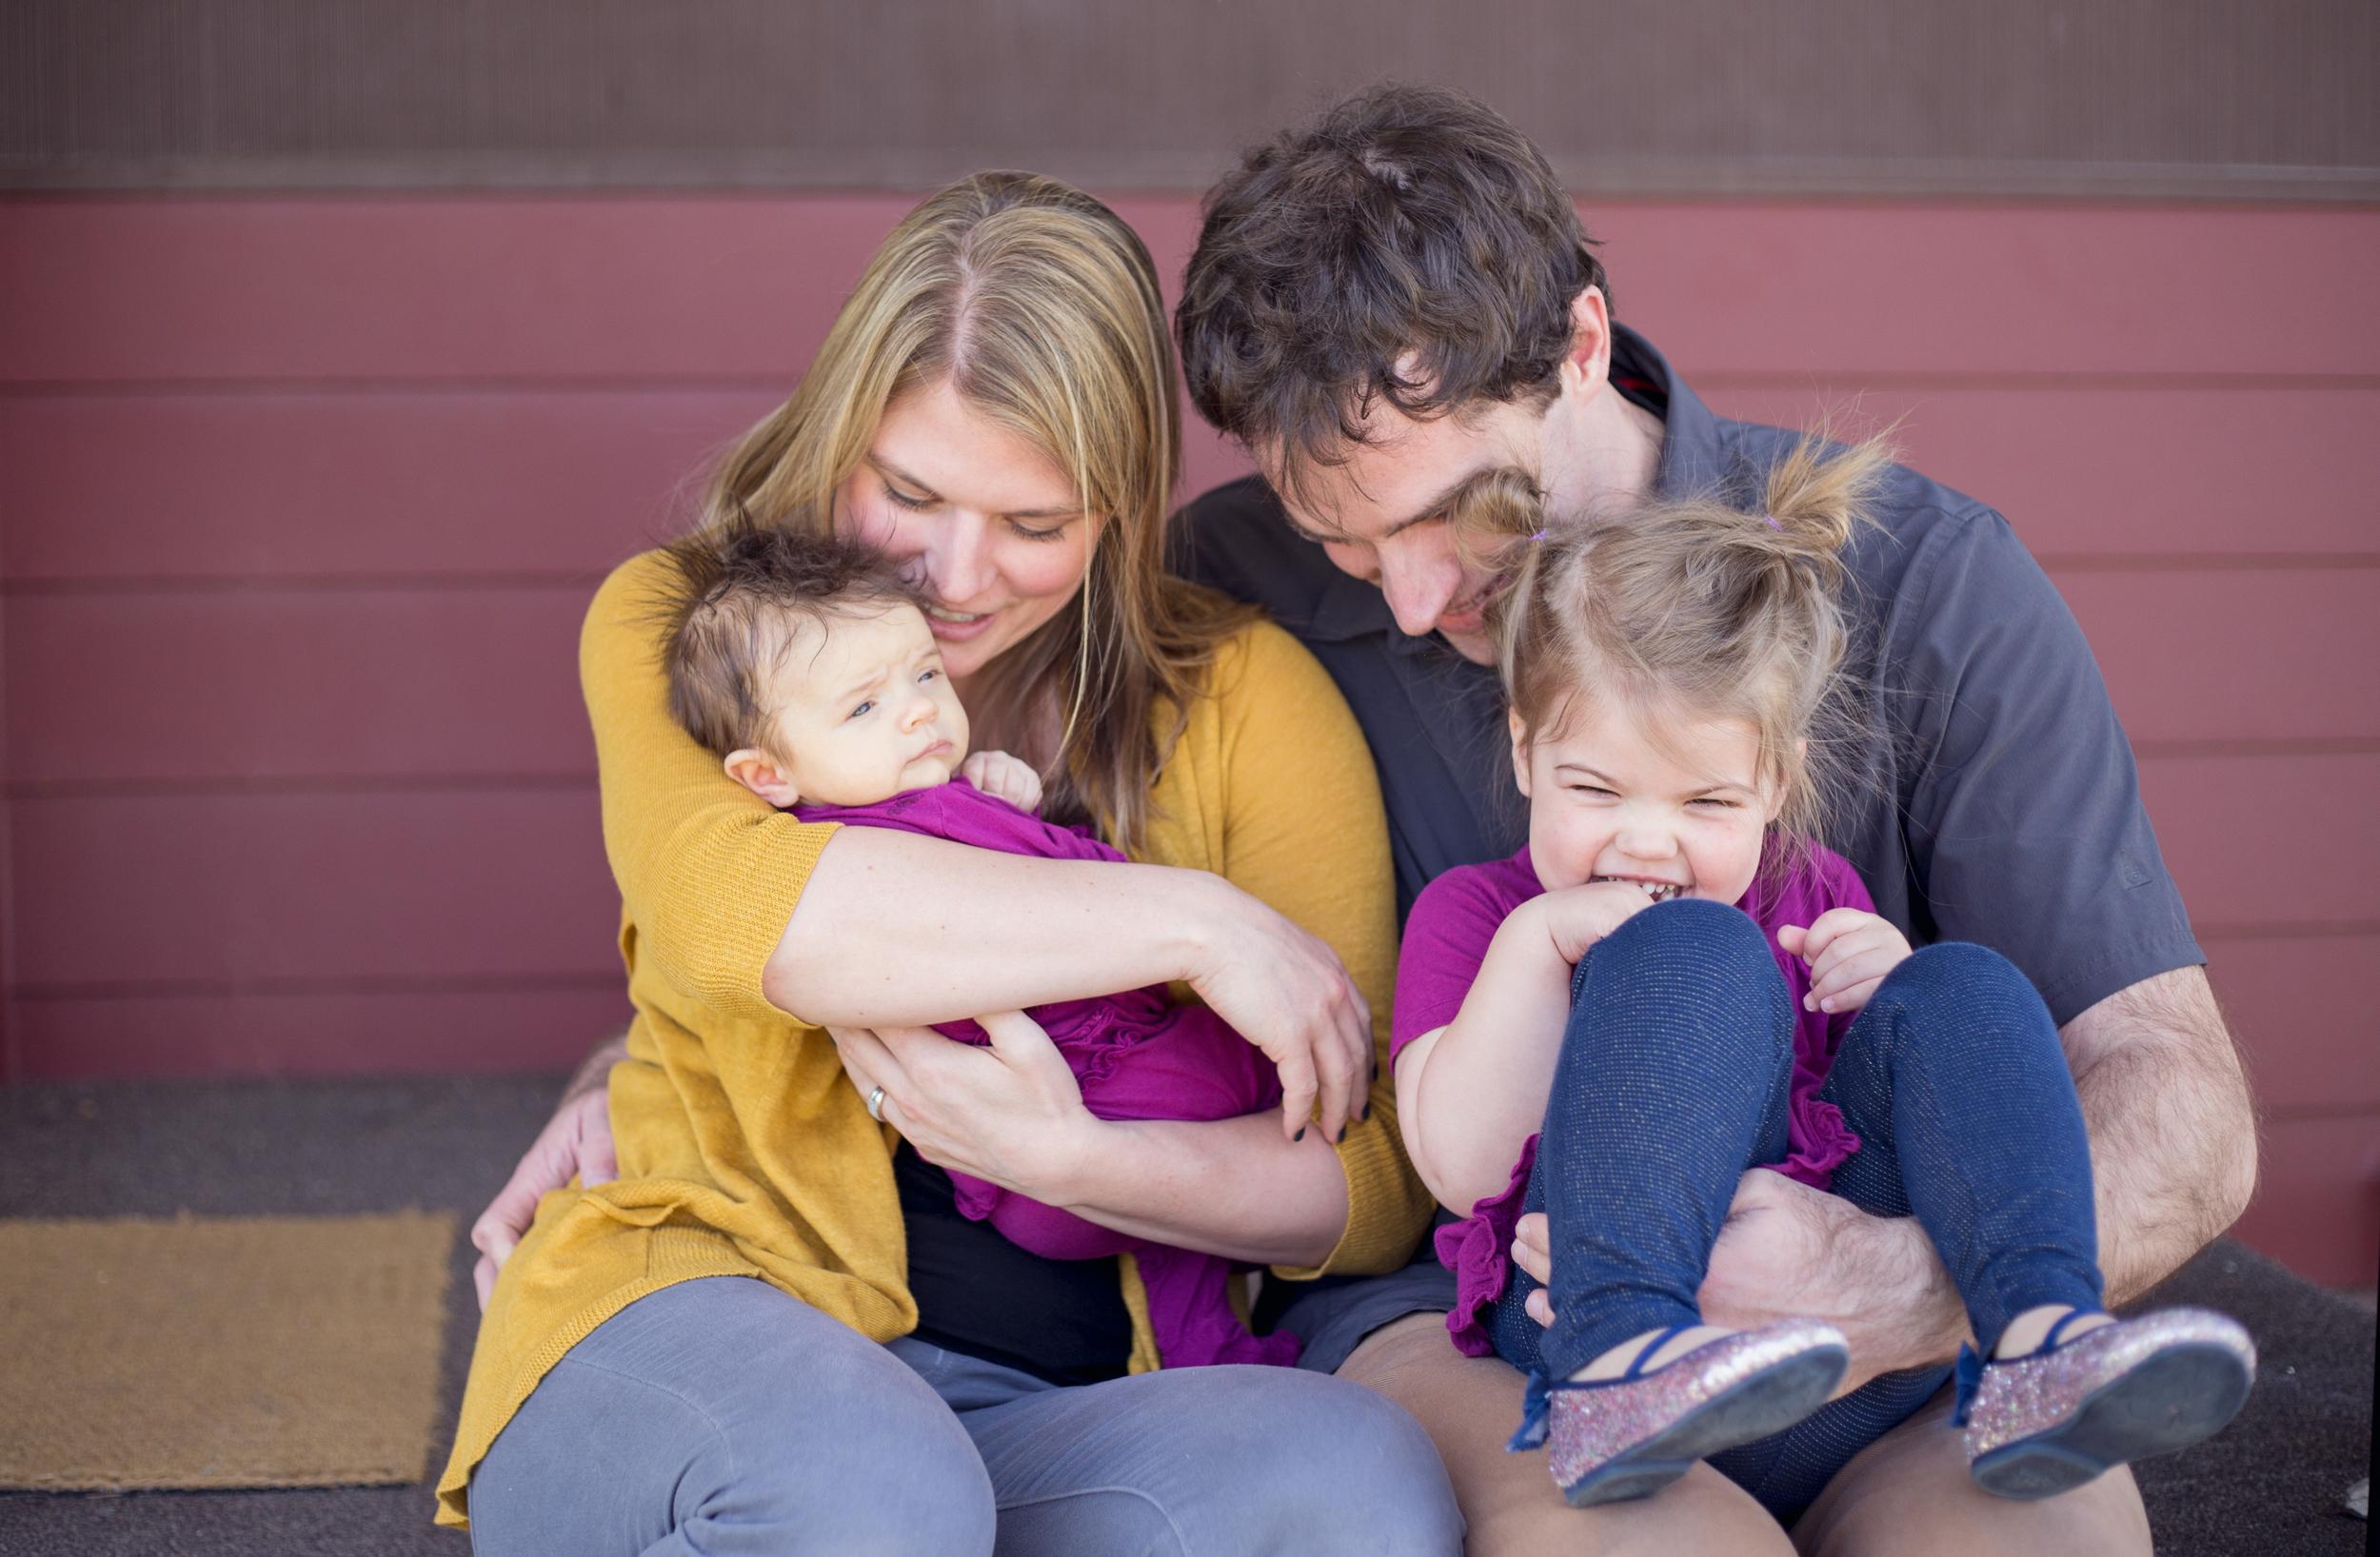 missoula-family-photography-kids-5.jpg